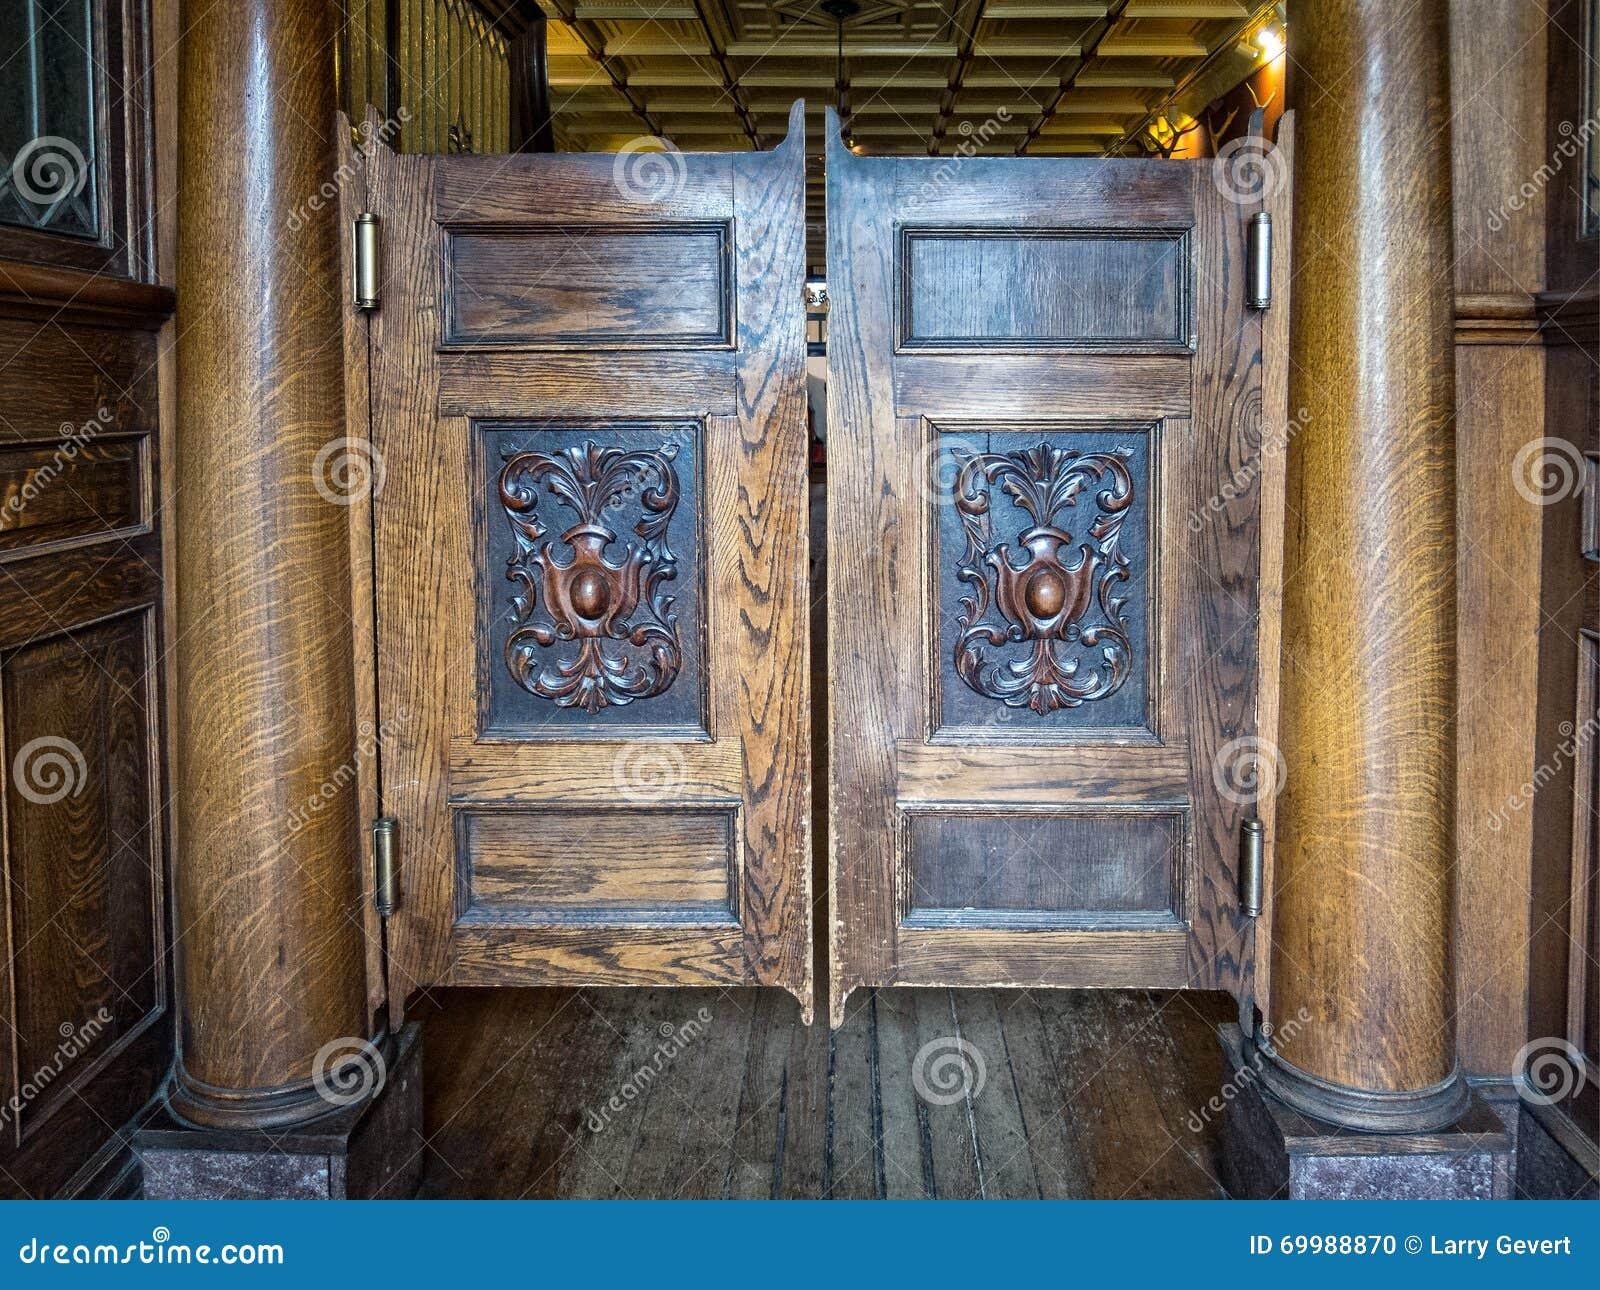 arizona classic doors historic saloon ... & Saloon Doors Stock Photo - Image: 69988870 Pezcame.Com